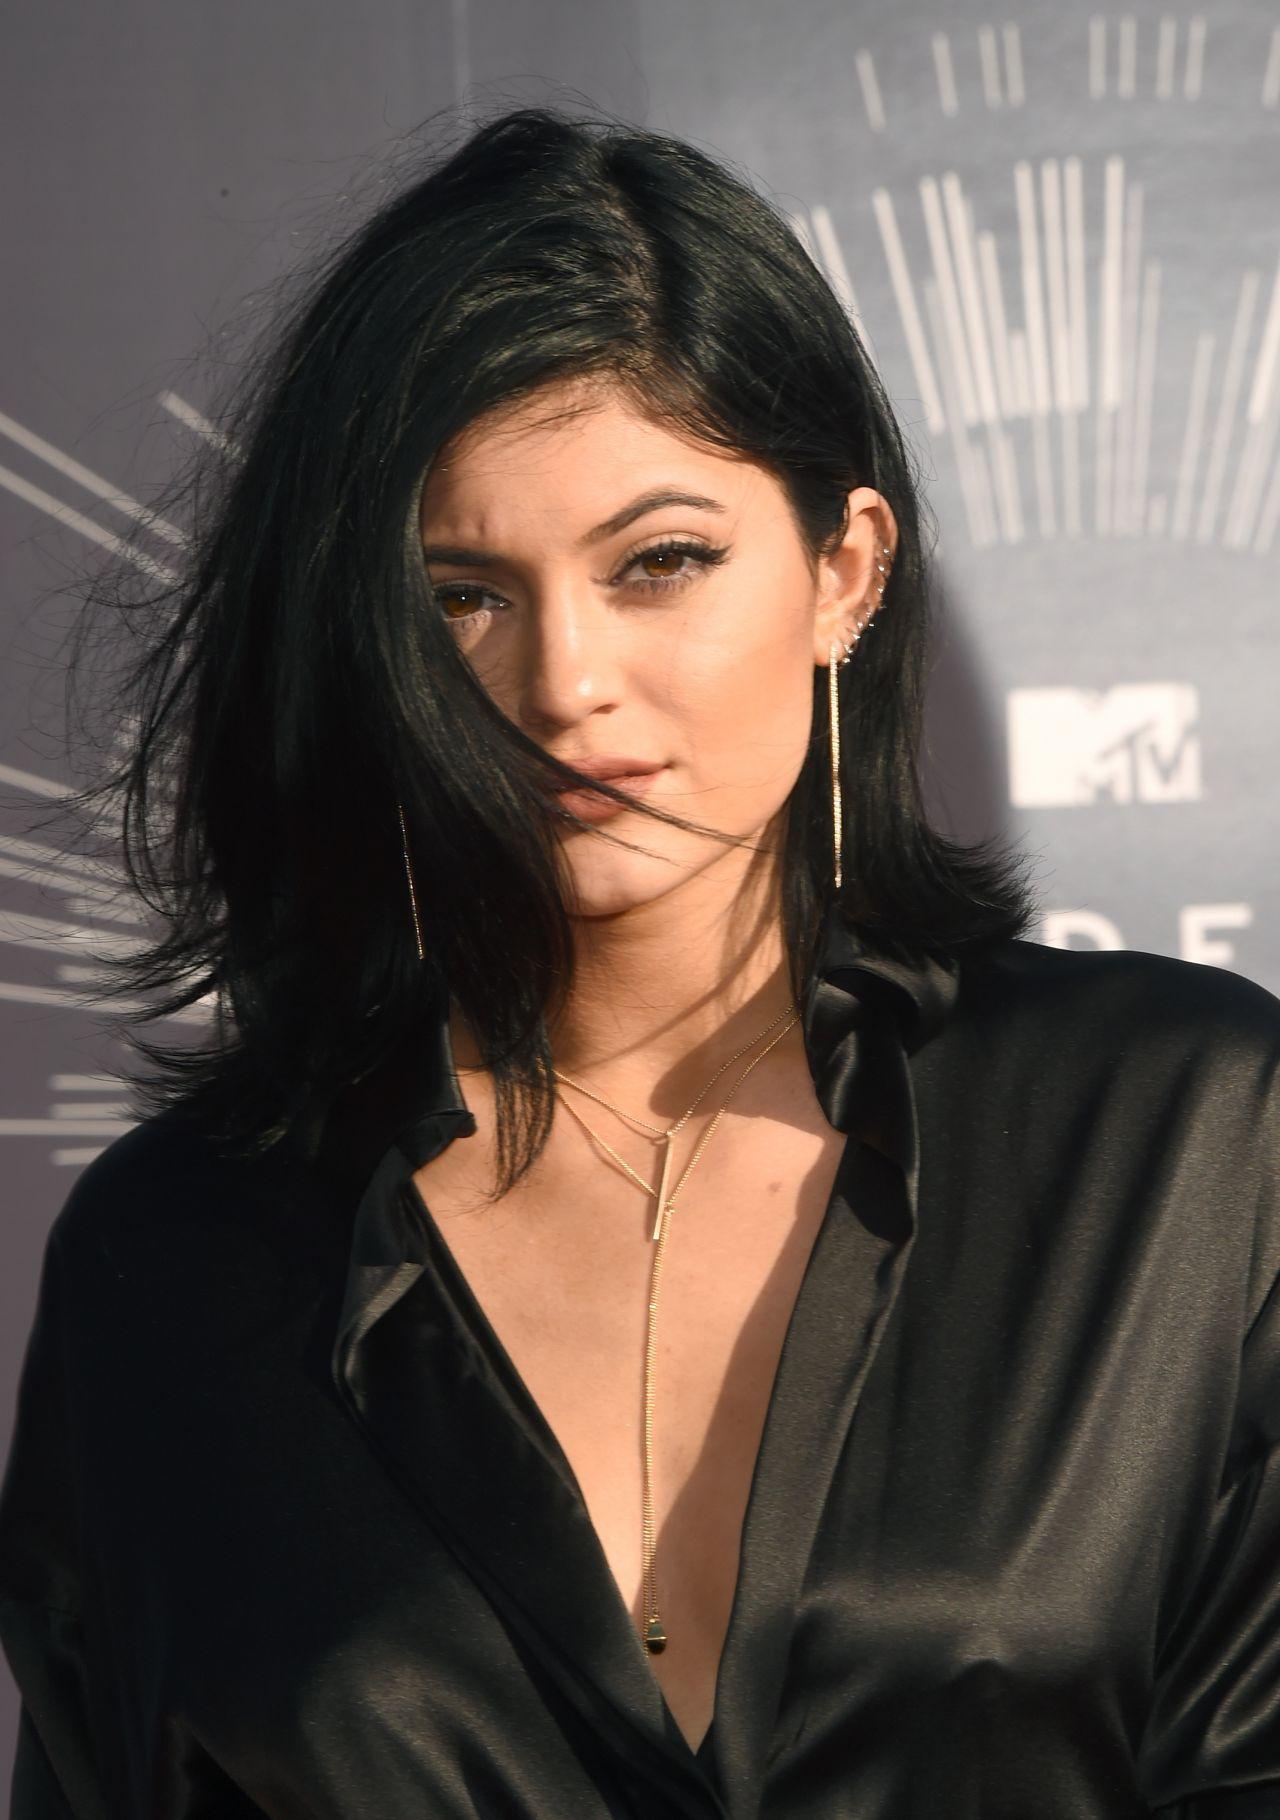 Kylie Jenner 2014 Mtv Video Music Awards In Inglewood